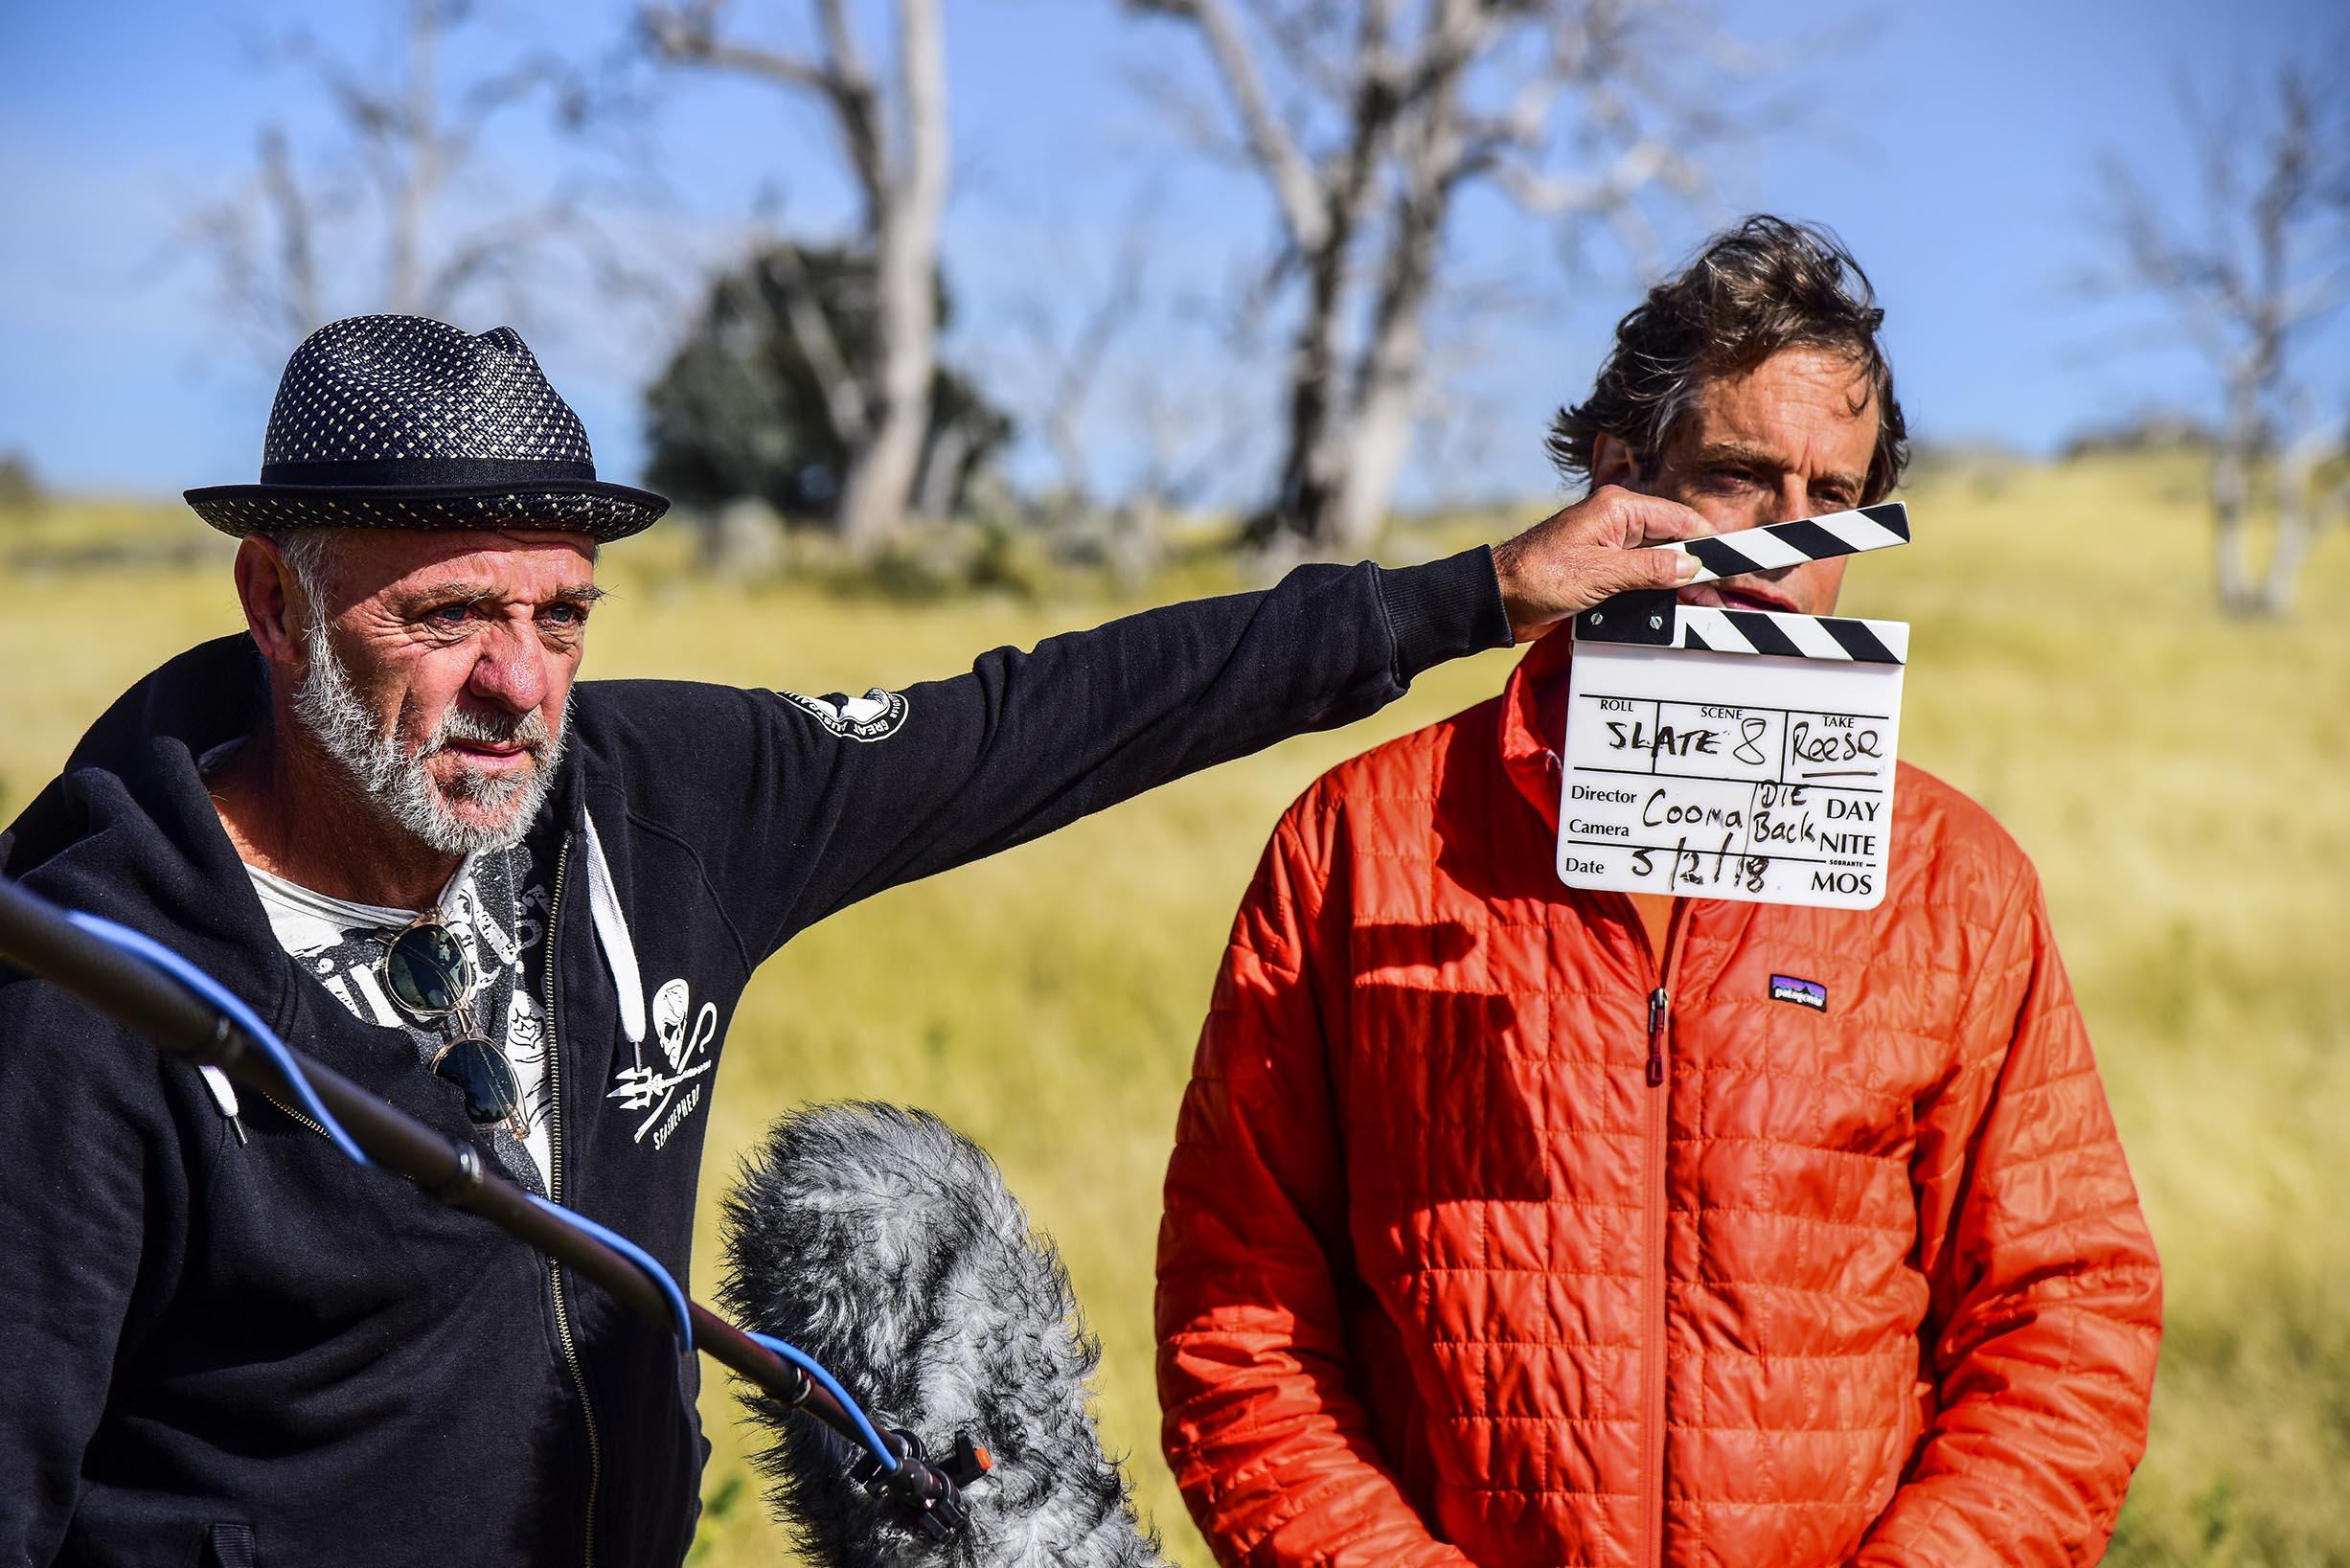 Cooma Monaro Graveyard Shoot - Reese Halter and David Field AUSTRALIA.jpg